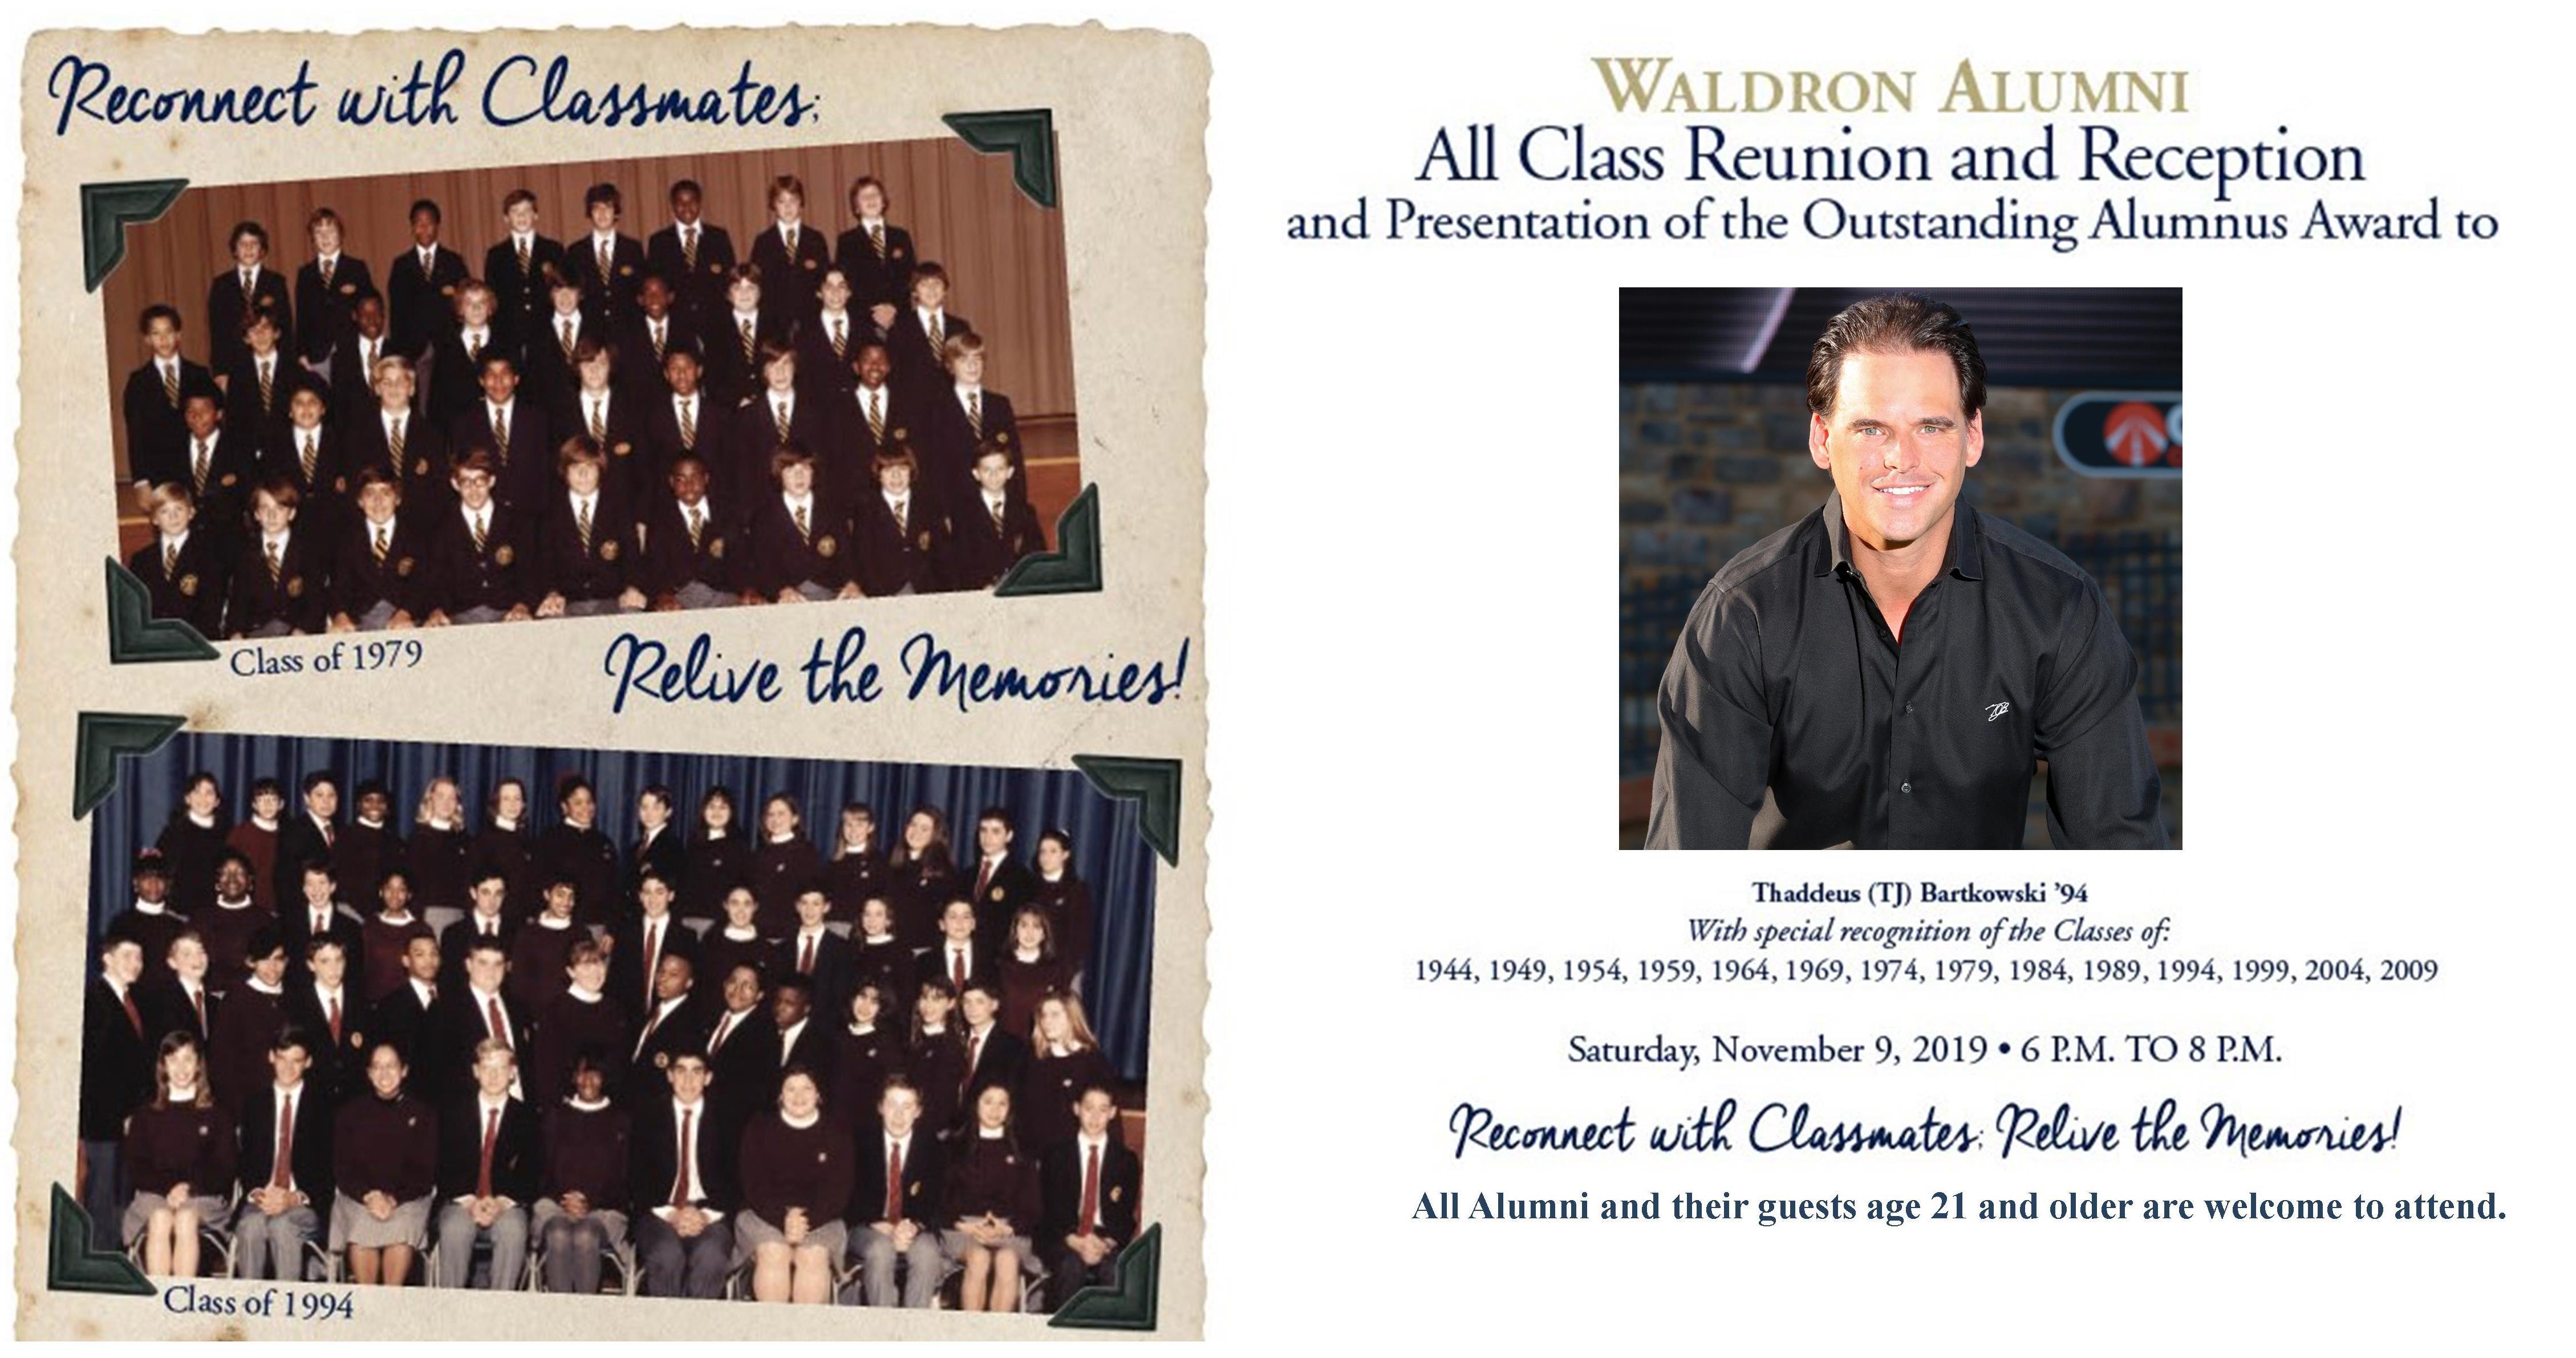 Alumni All Class Reunion & Reception